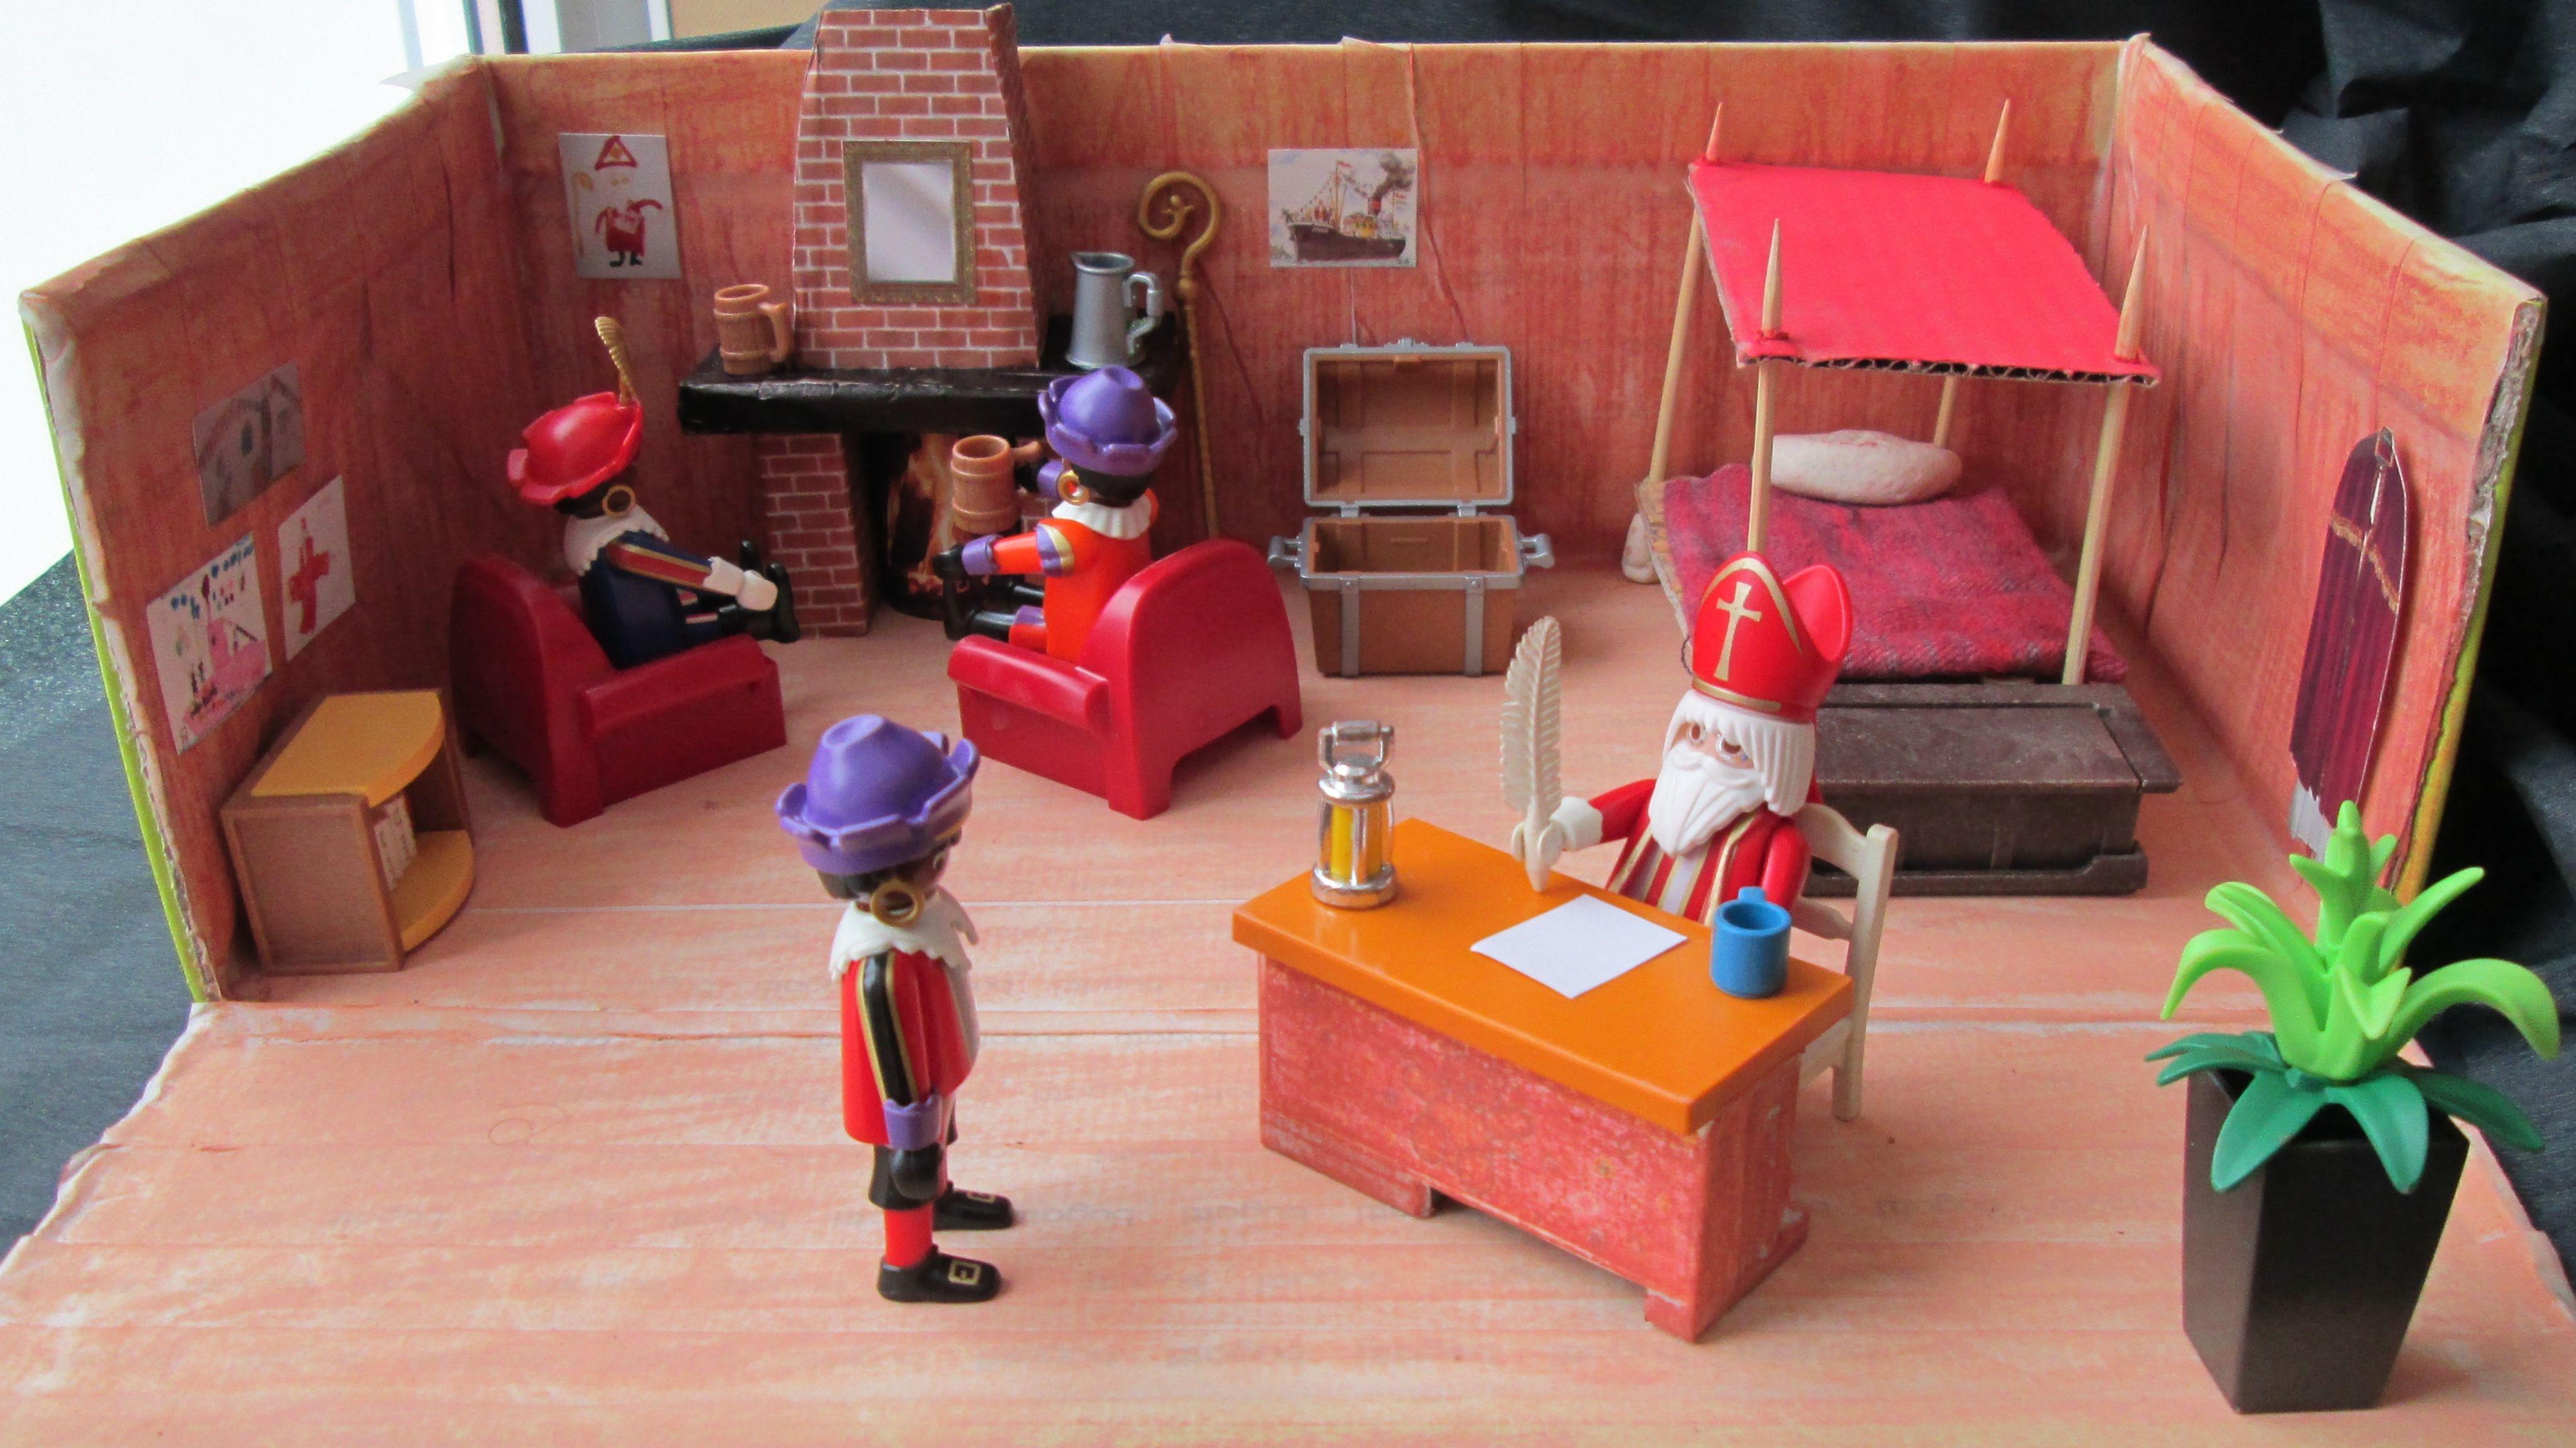 Playmobil Dollhouse Slaapkamer : Sinterklaas werk slaapkamer verteltafel nutsschool maastricht